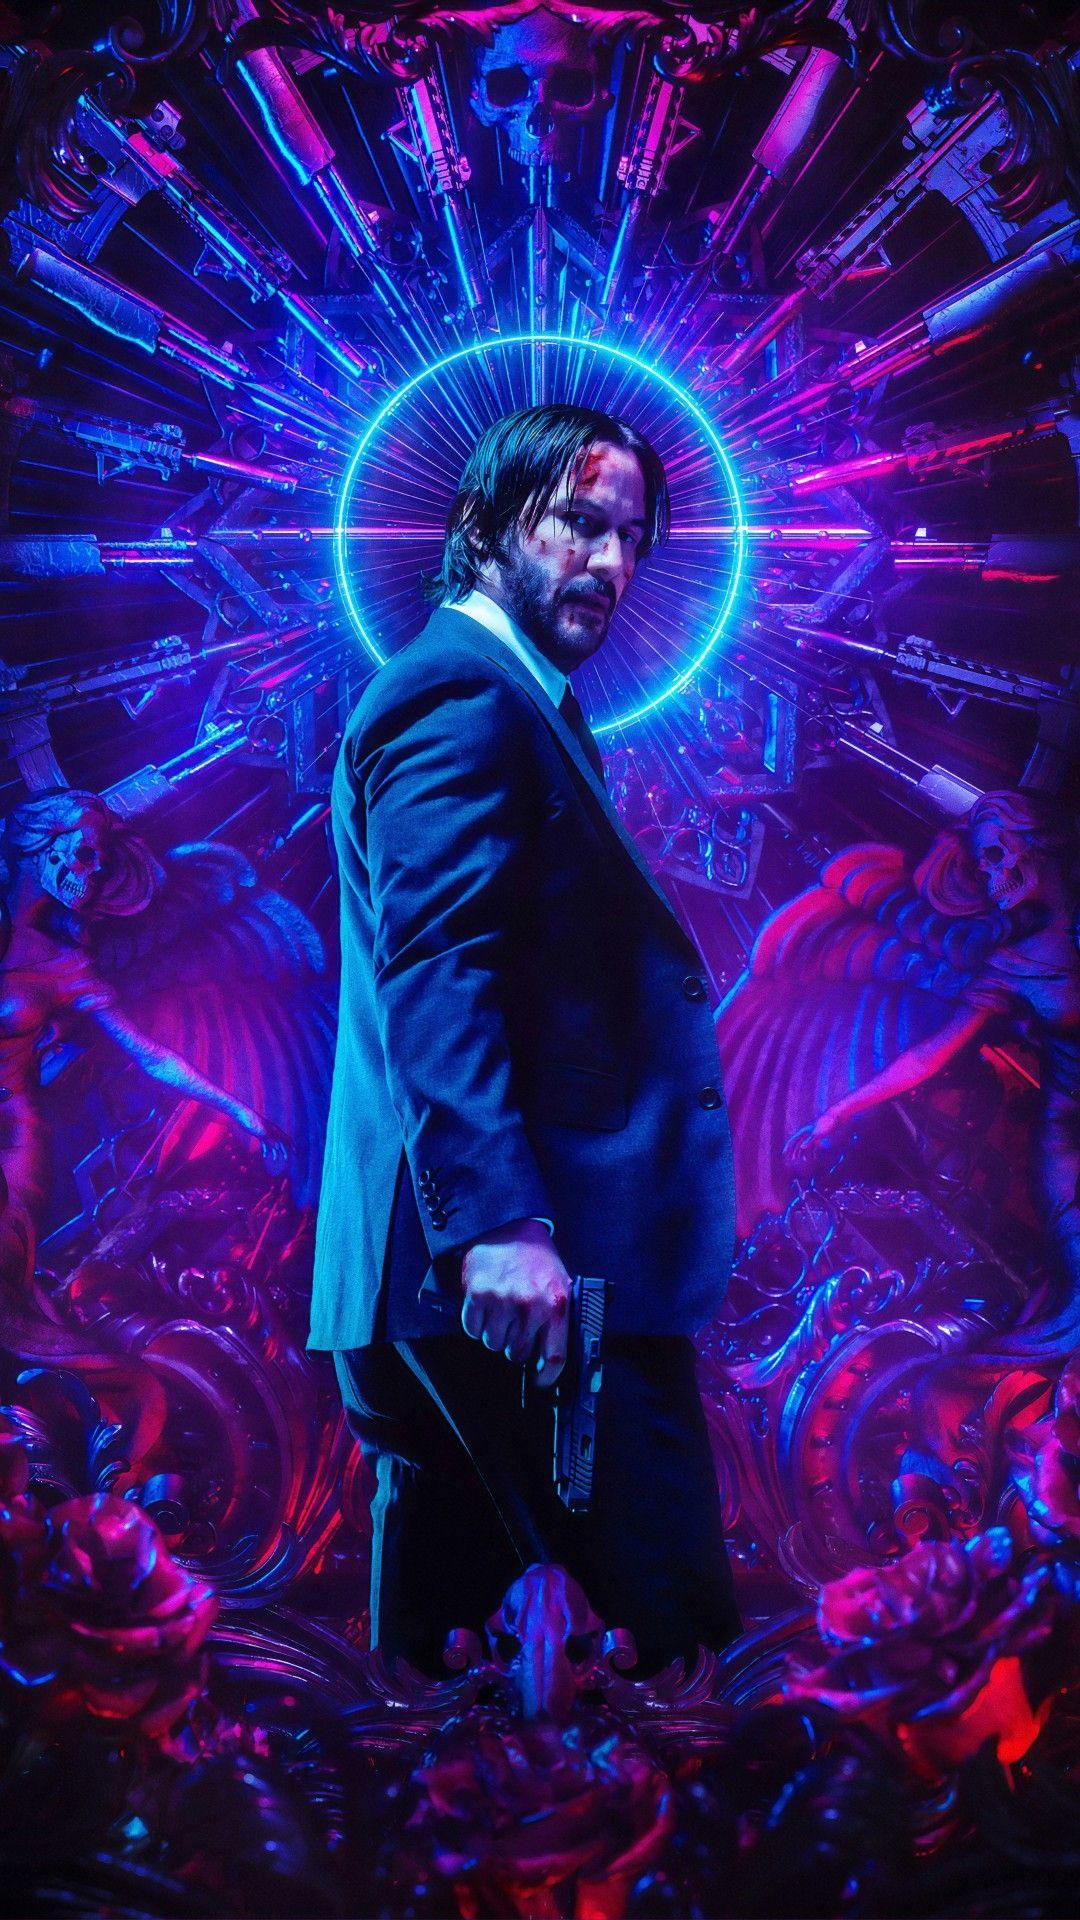 John Wick Movie Wallpapers Movie Poster Art Keanu Reeves John Wick